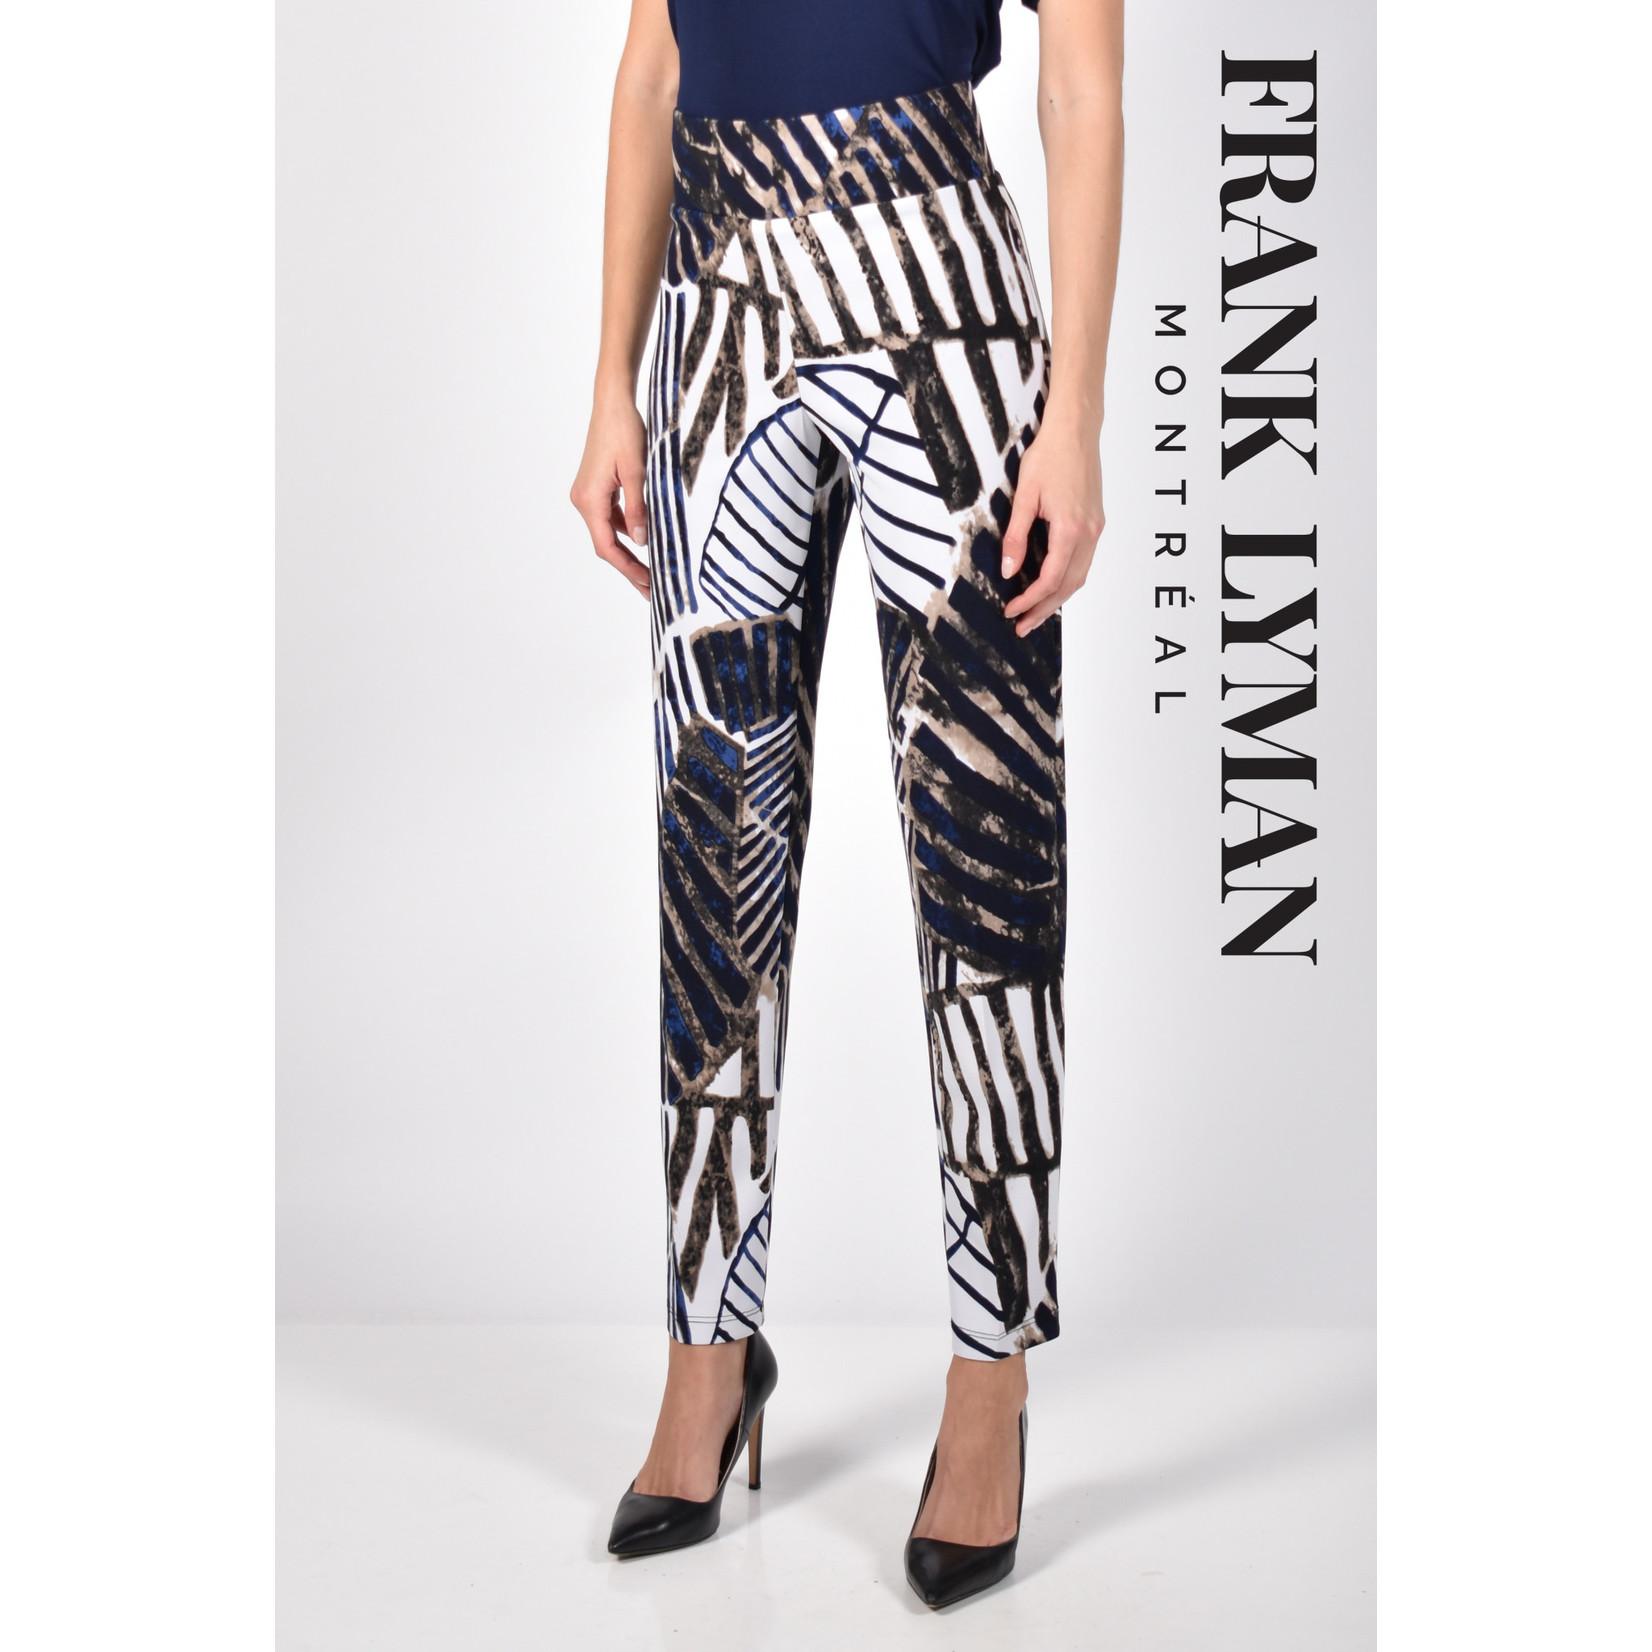 Frank Lyman Blue / White / Beige Knit Pant